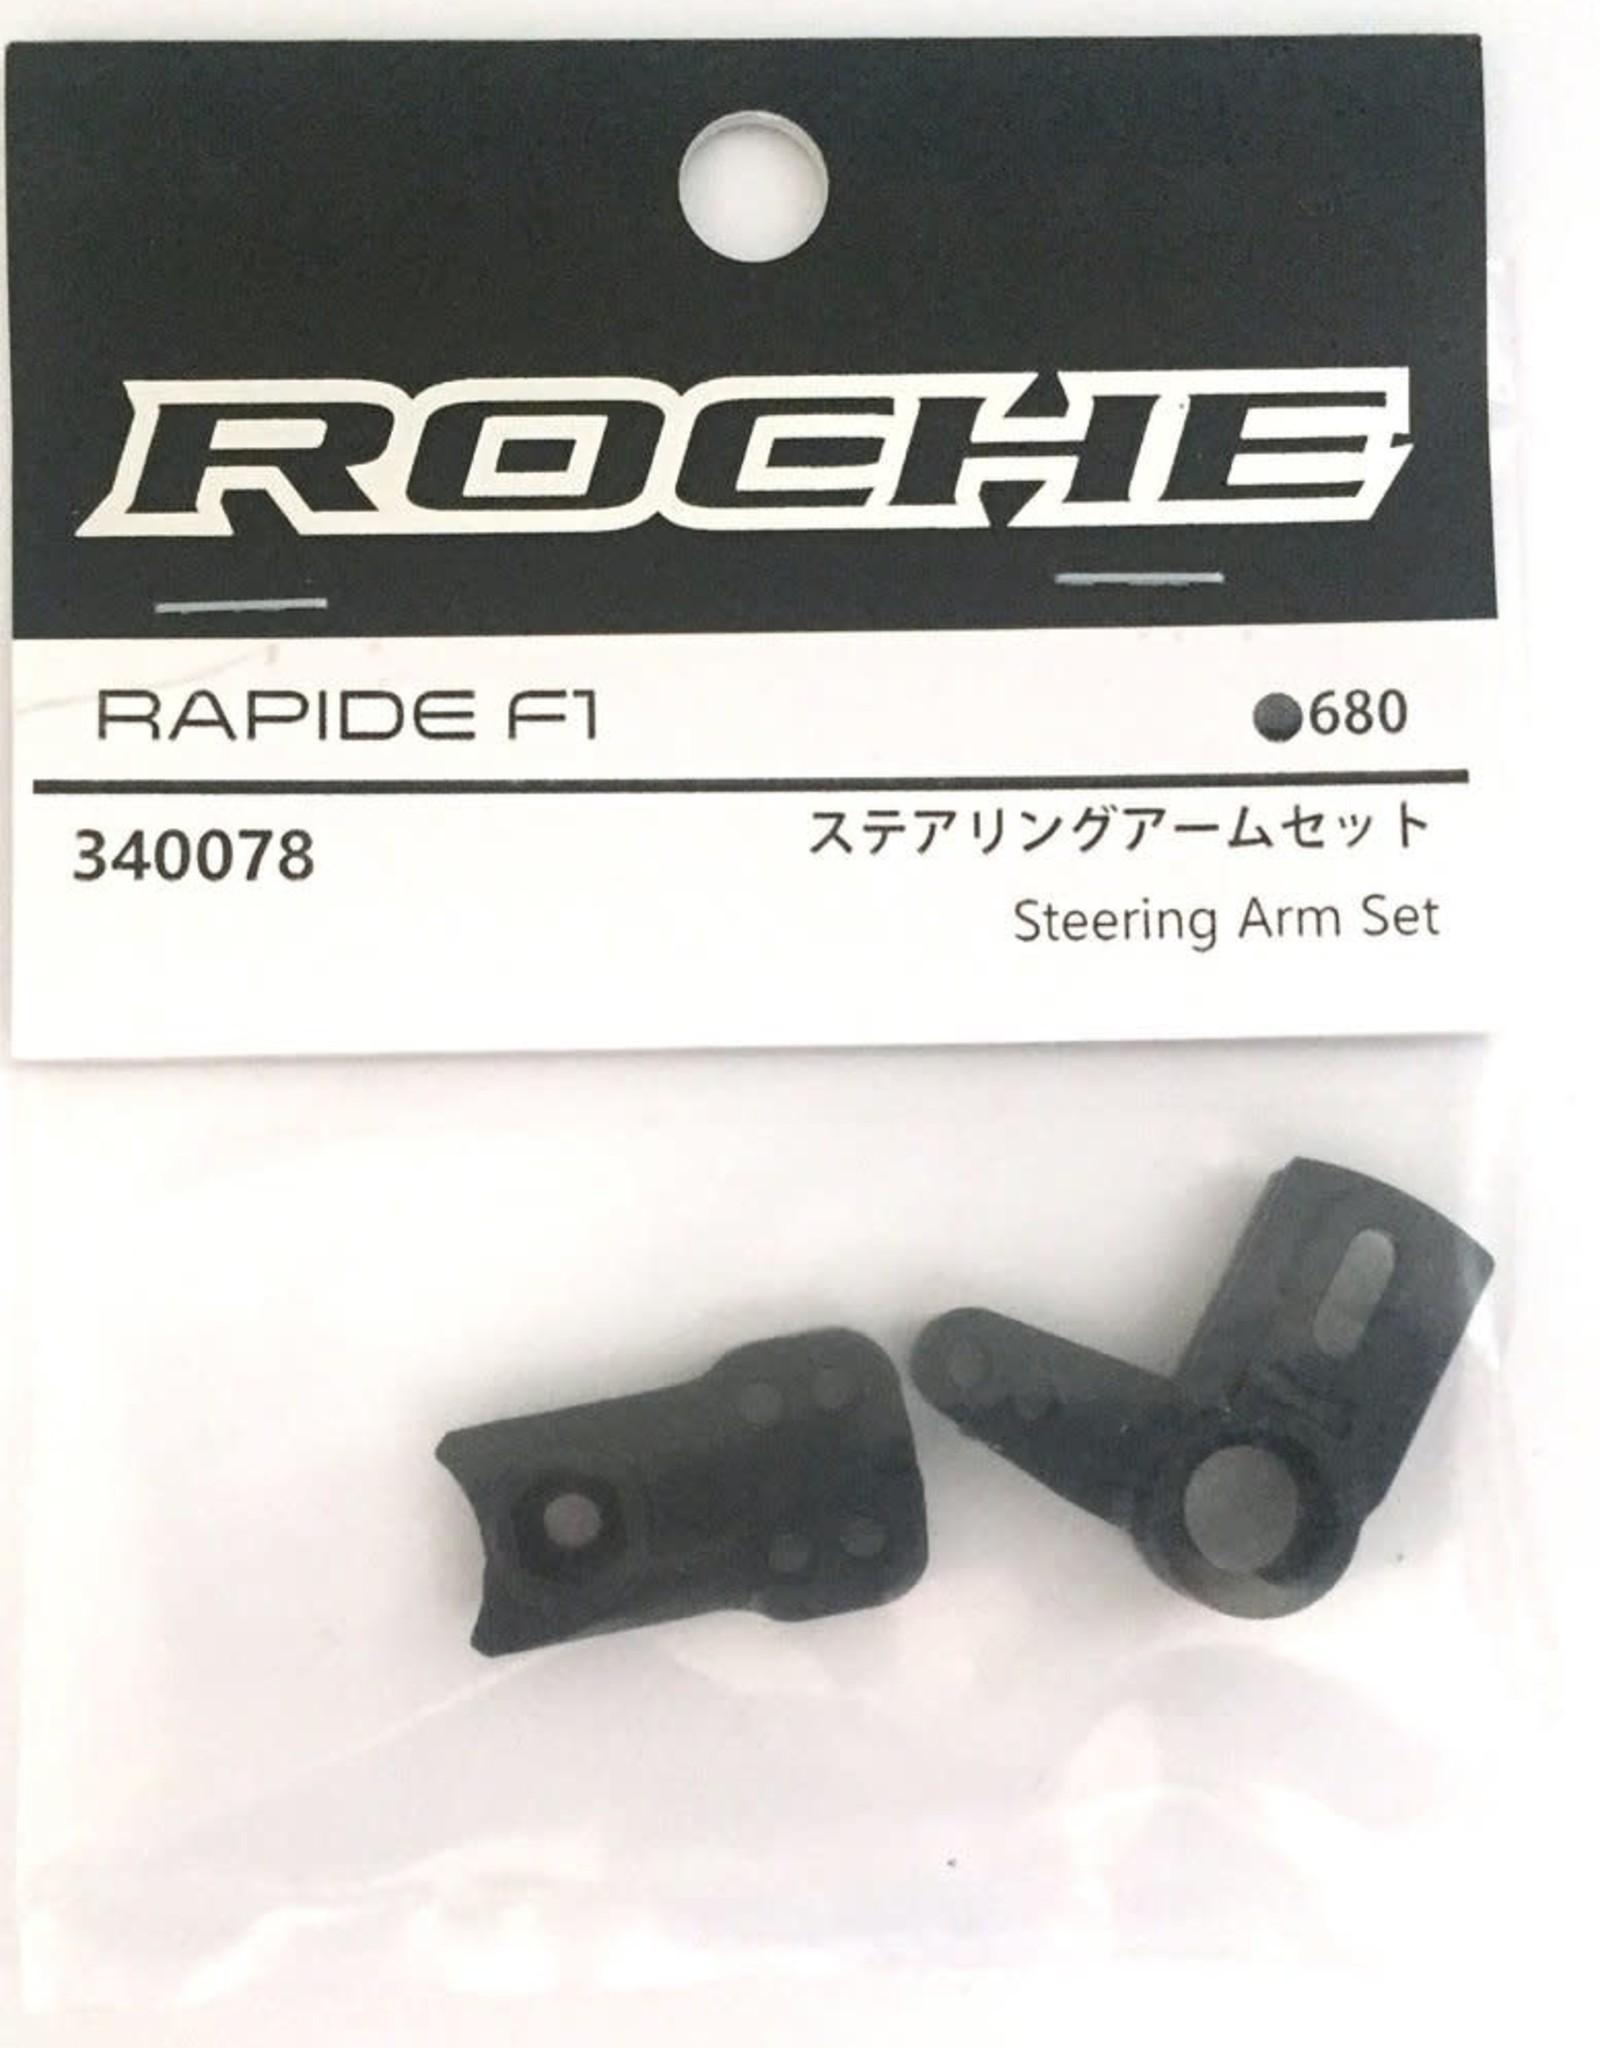 Roche Steering Arm Set, Rapide F1-16